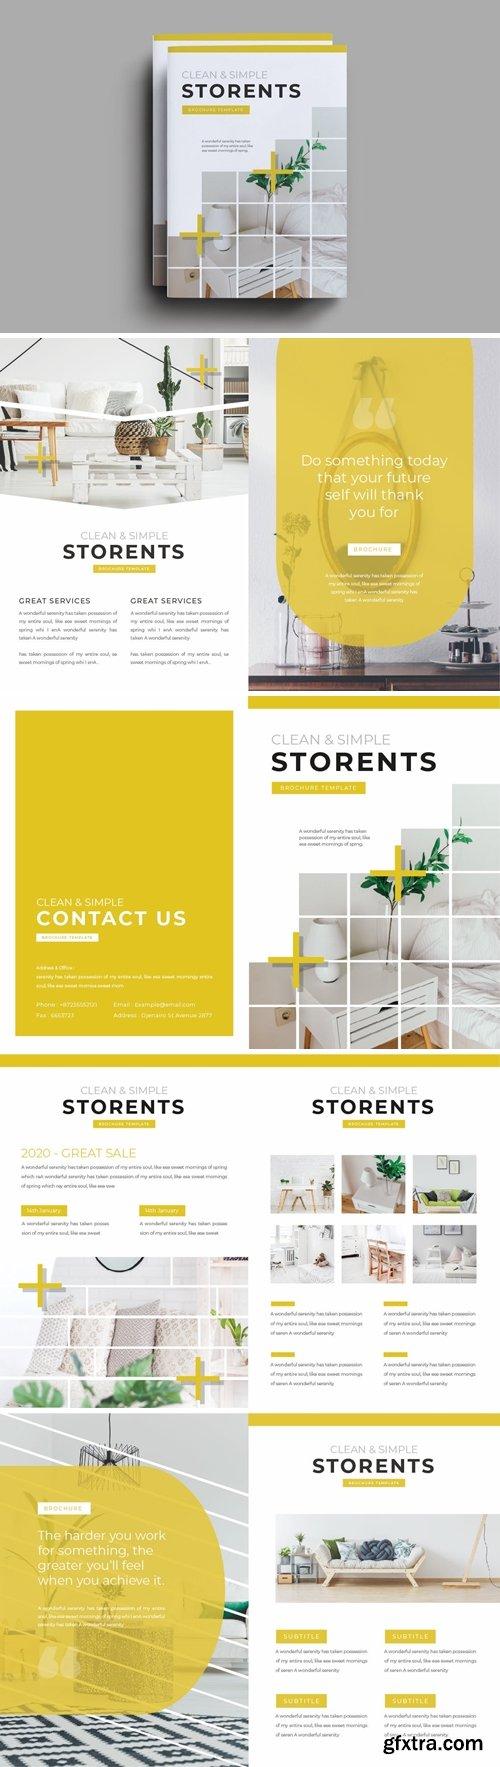 Storents Brochure Template